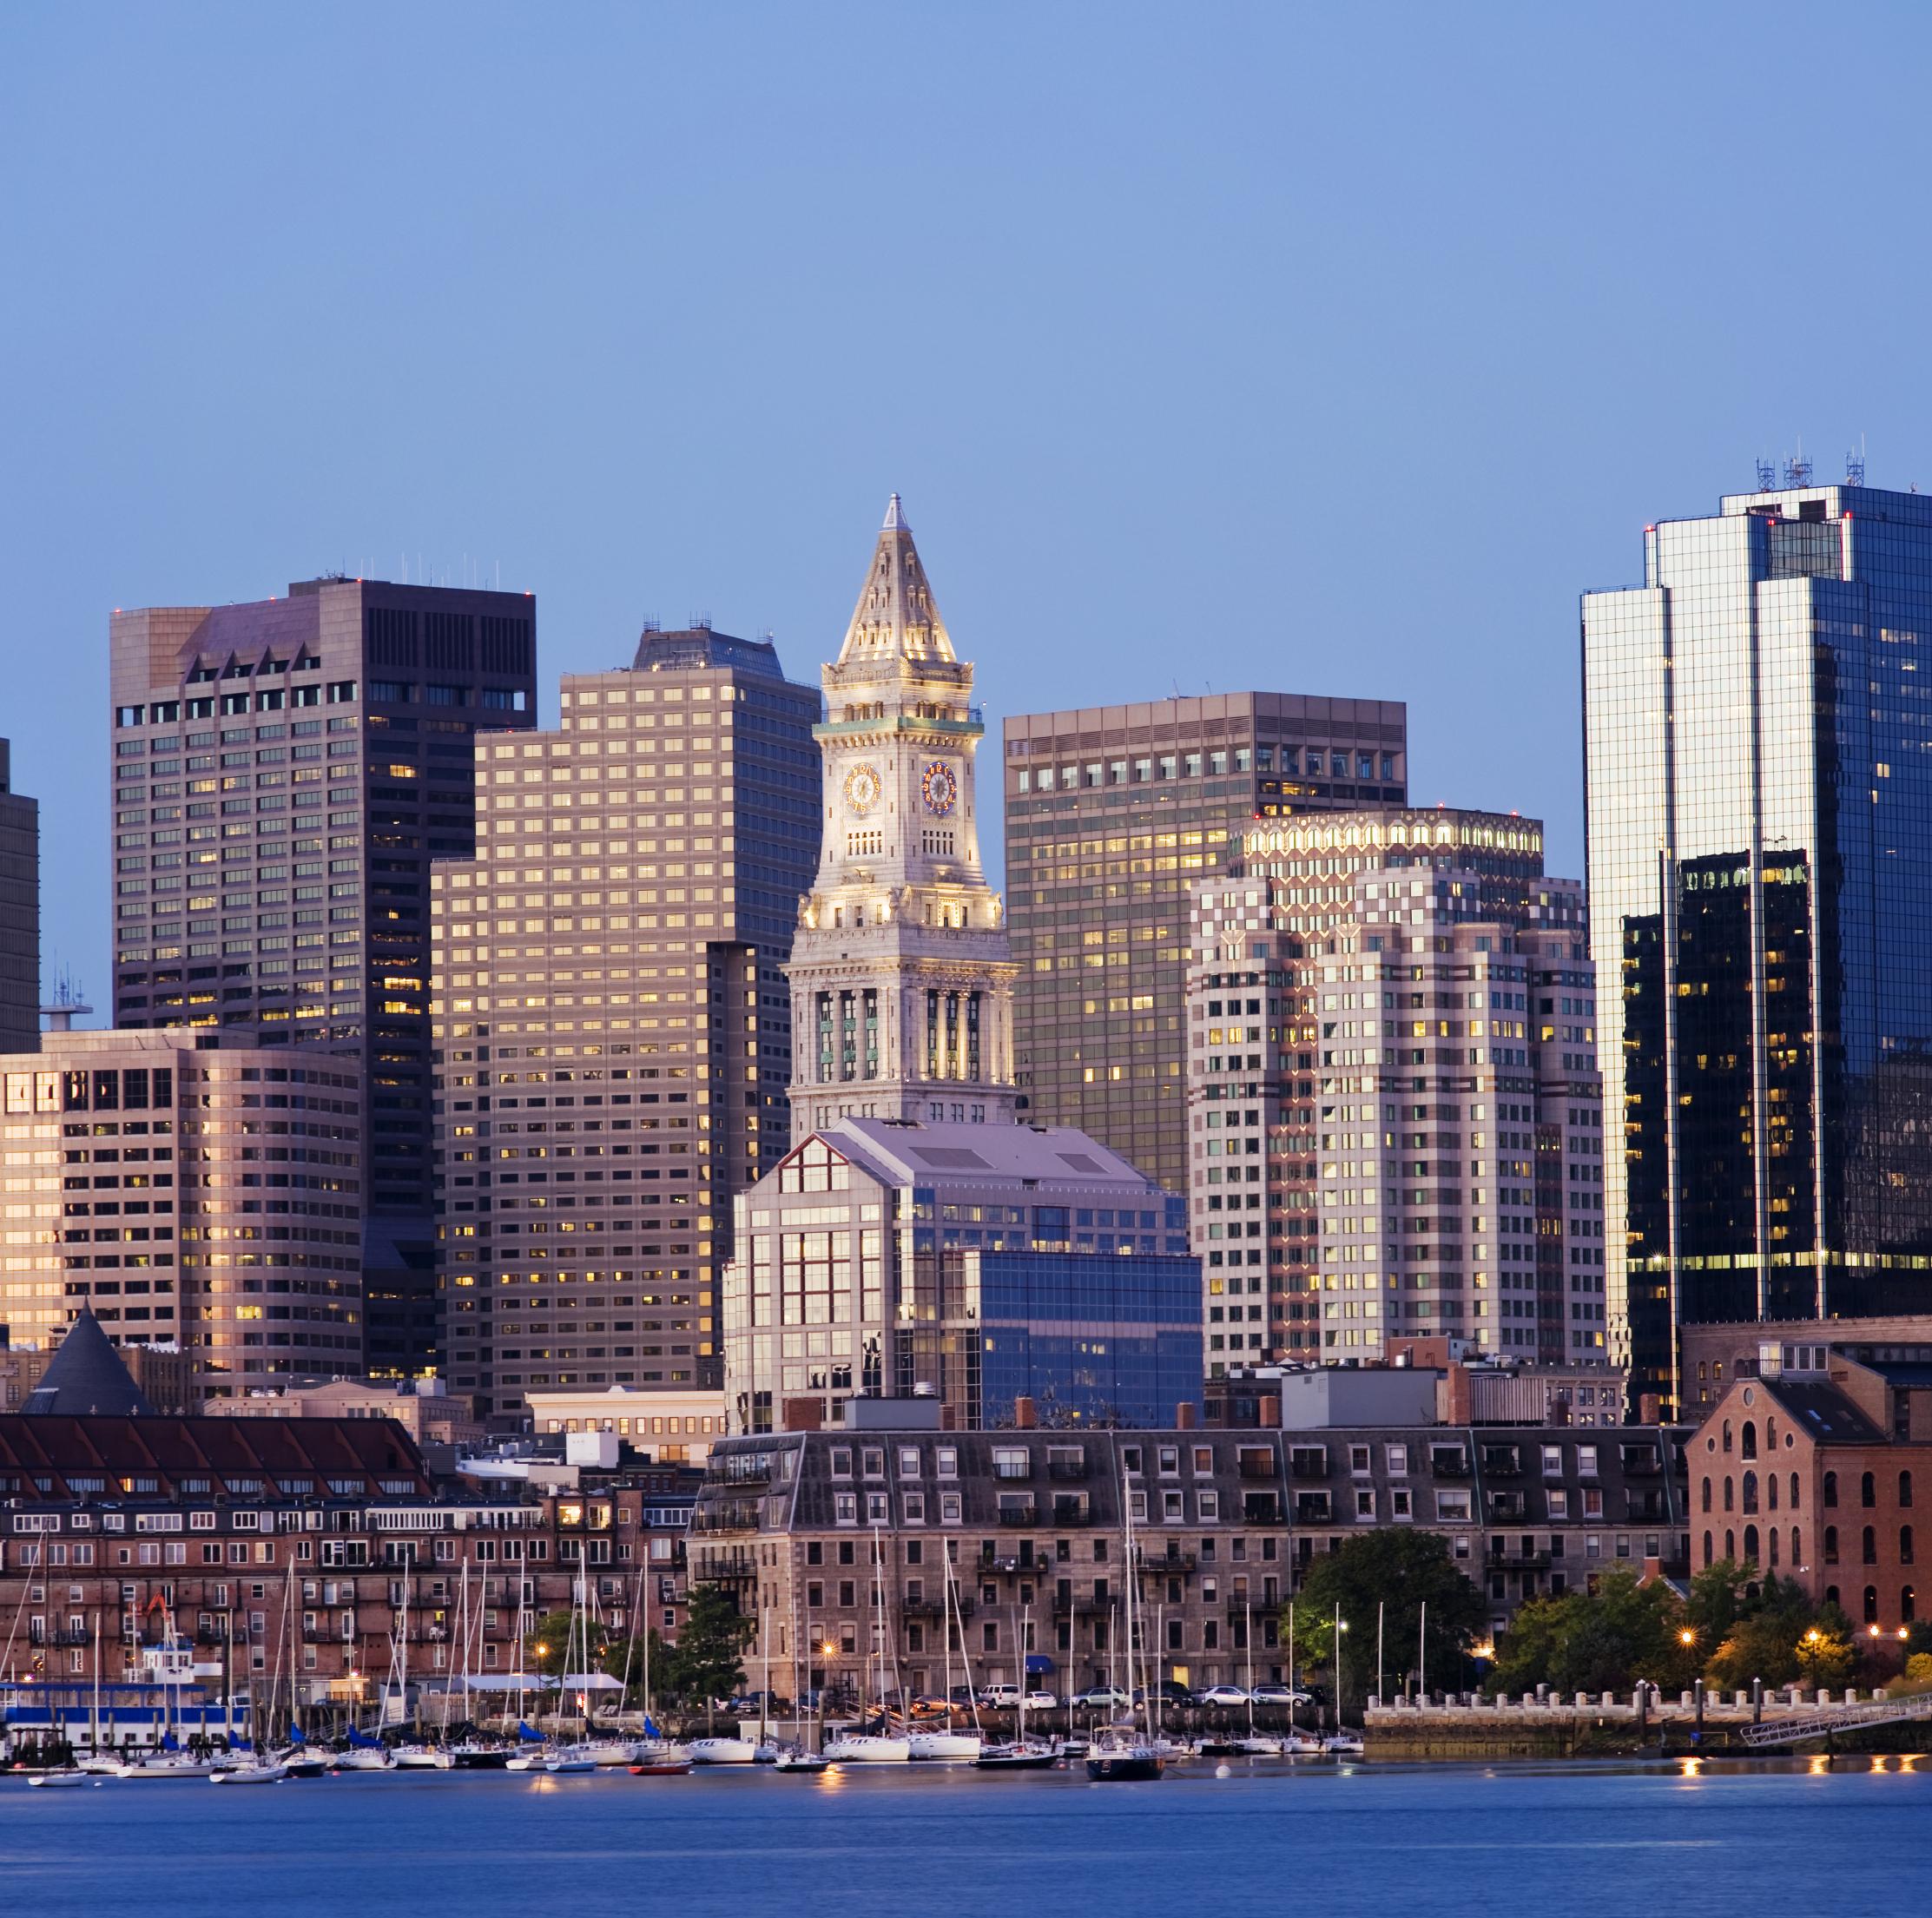 Boston Life Science